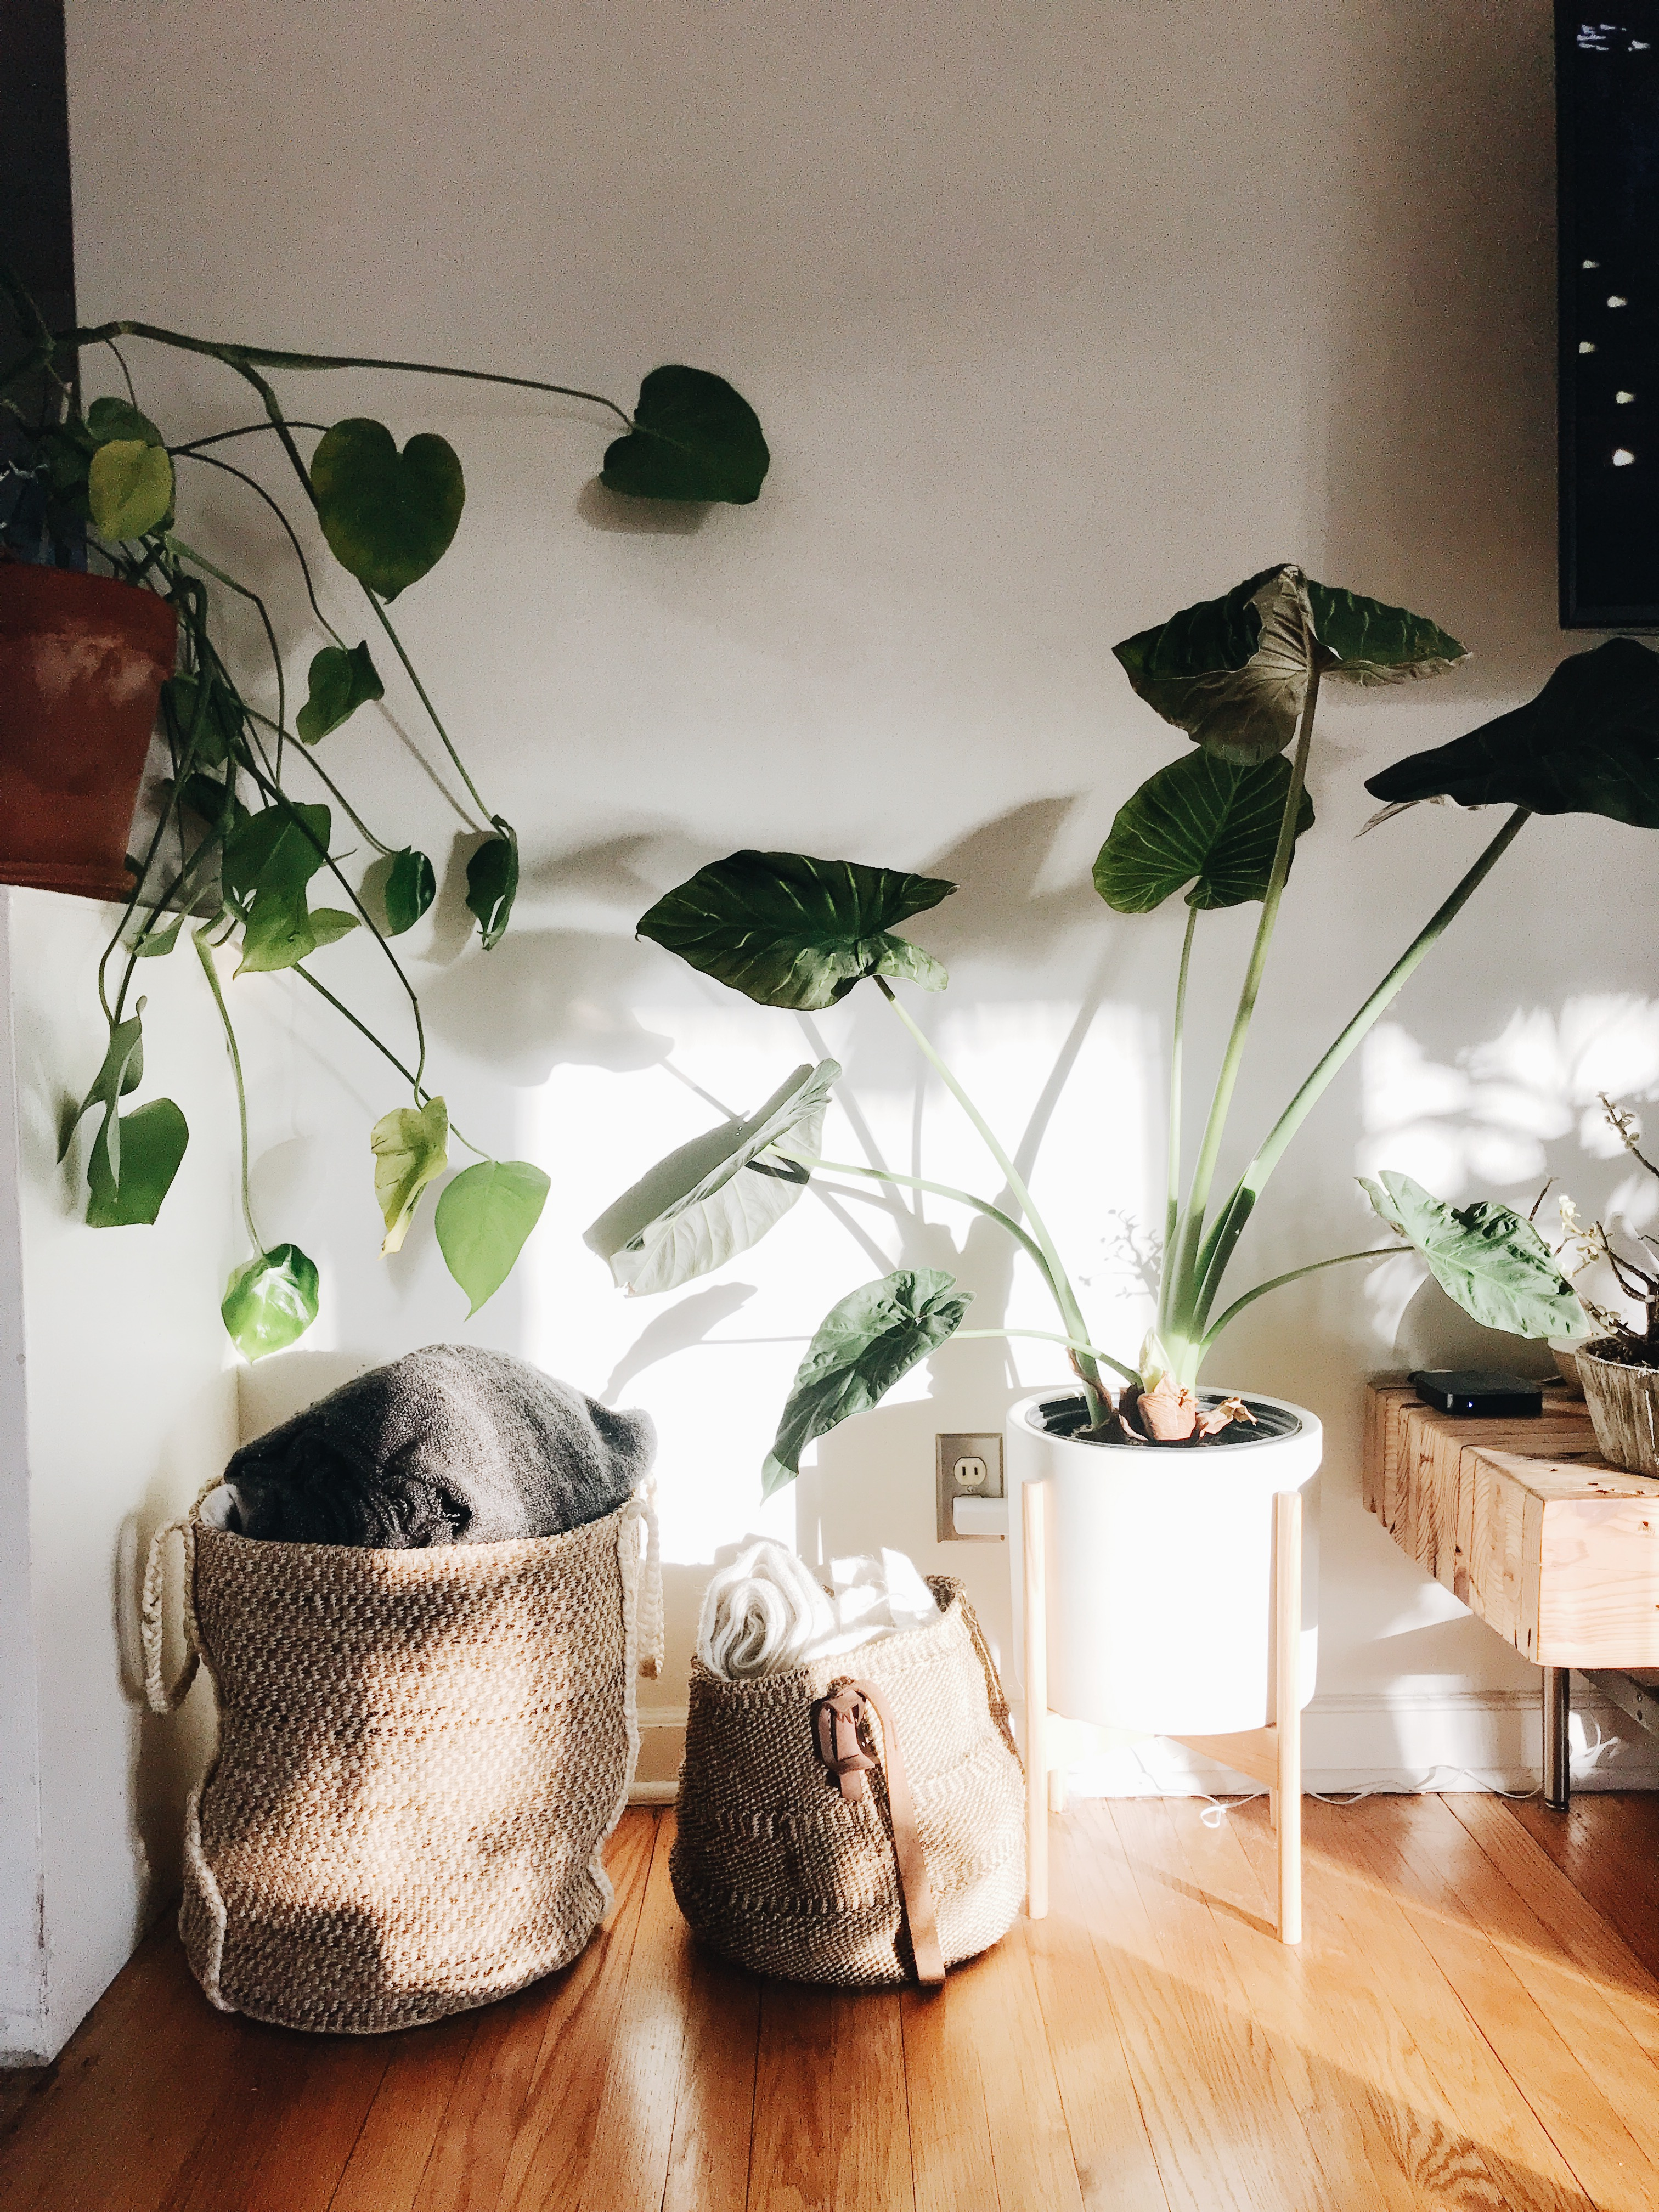 sunlight on baskets